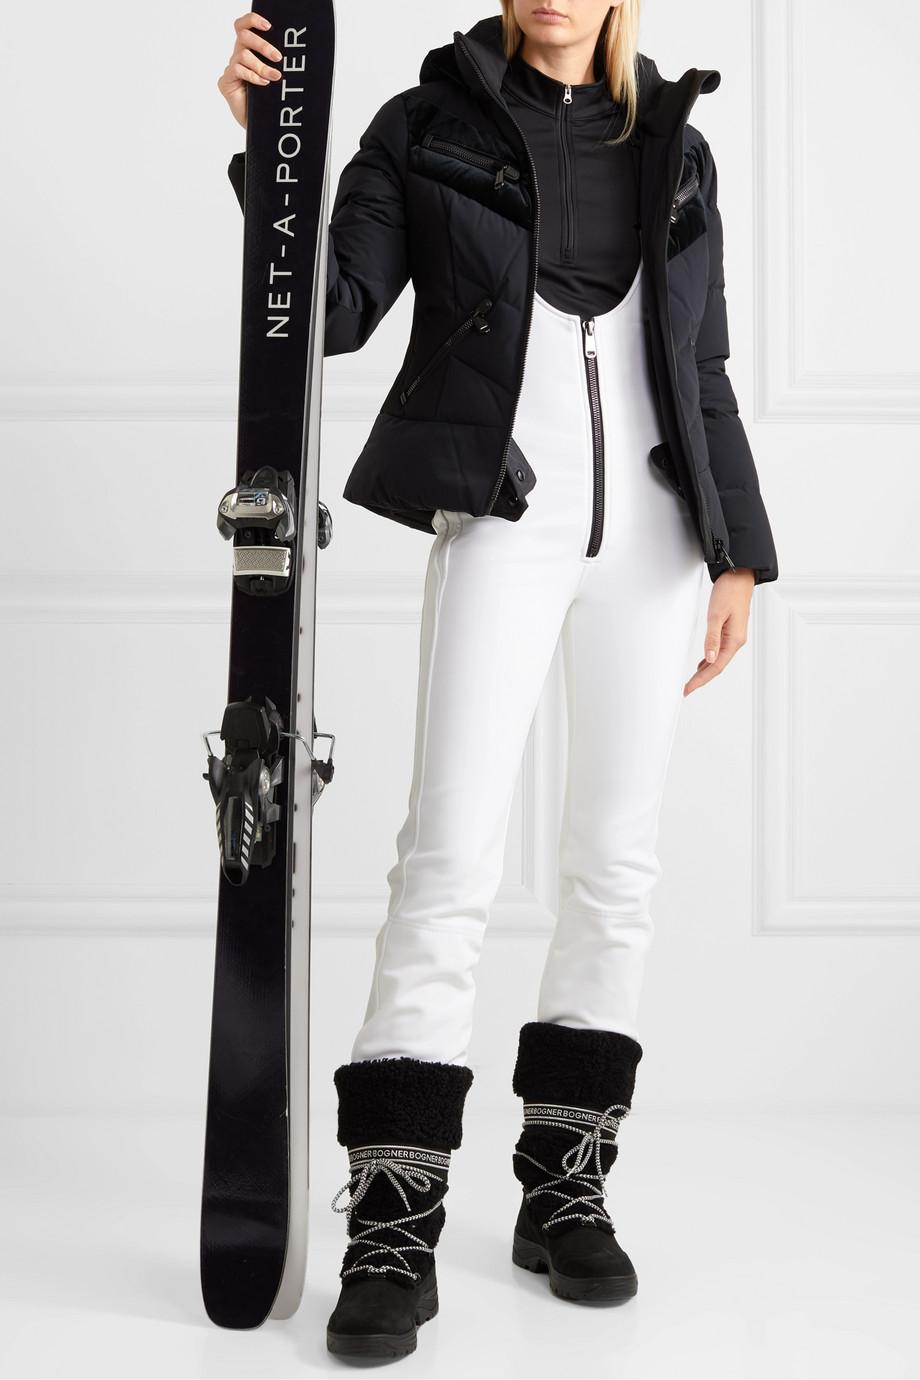 Goldbergh Salopette de ski en tissu technique Phoebe